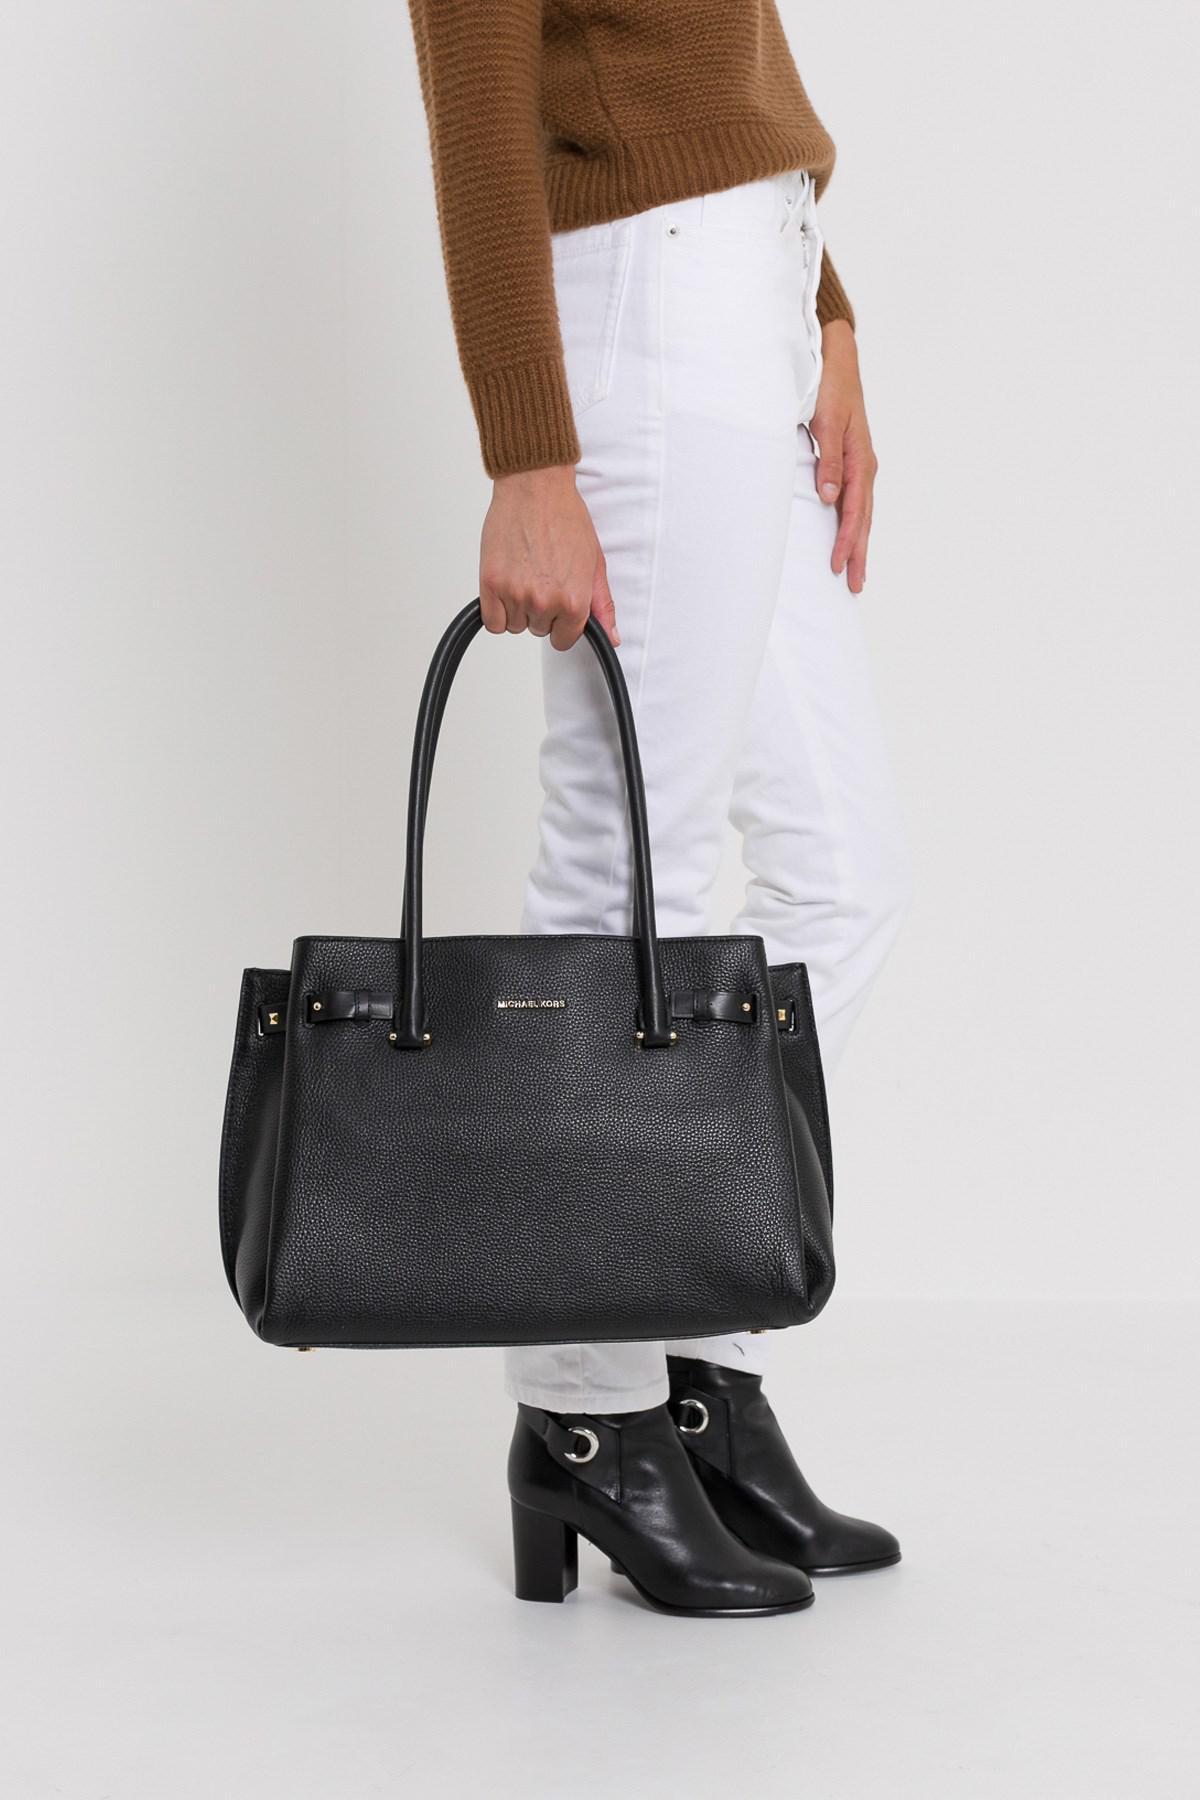 fc89baa092ad MICHAEL Michael Kors Addison Tote Bag in Black - Lyst